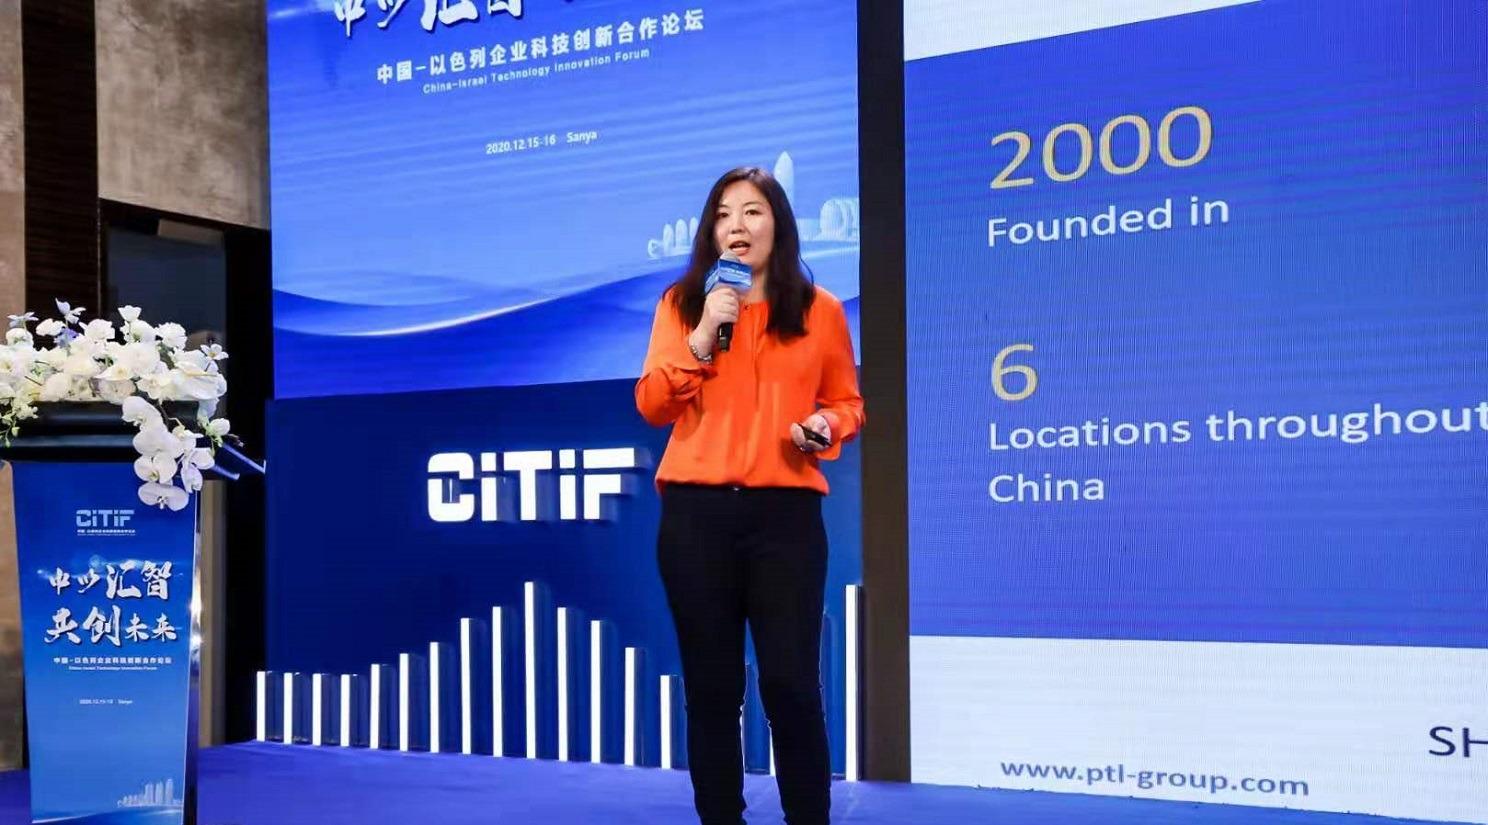 PTL Group's operational support for startups. Jun Peng